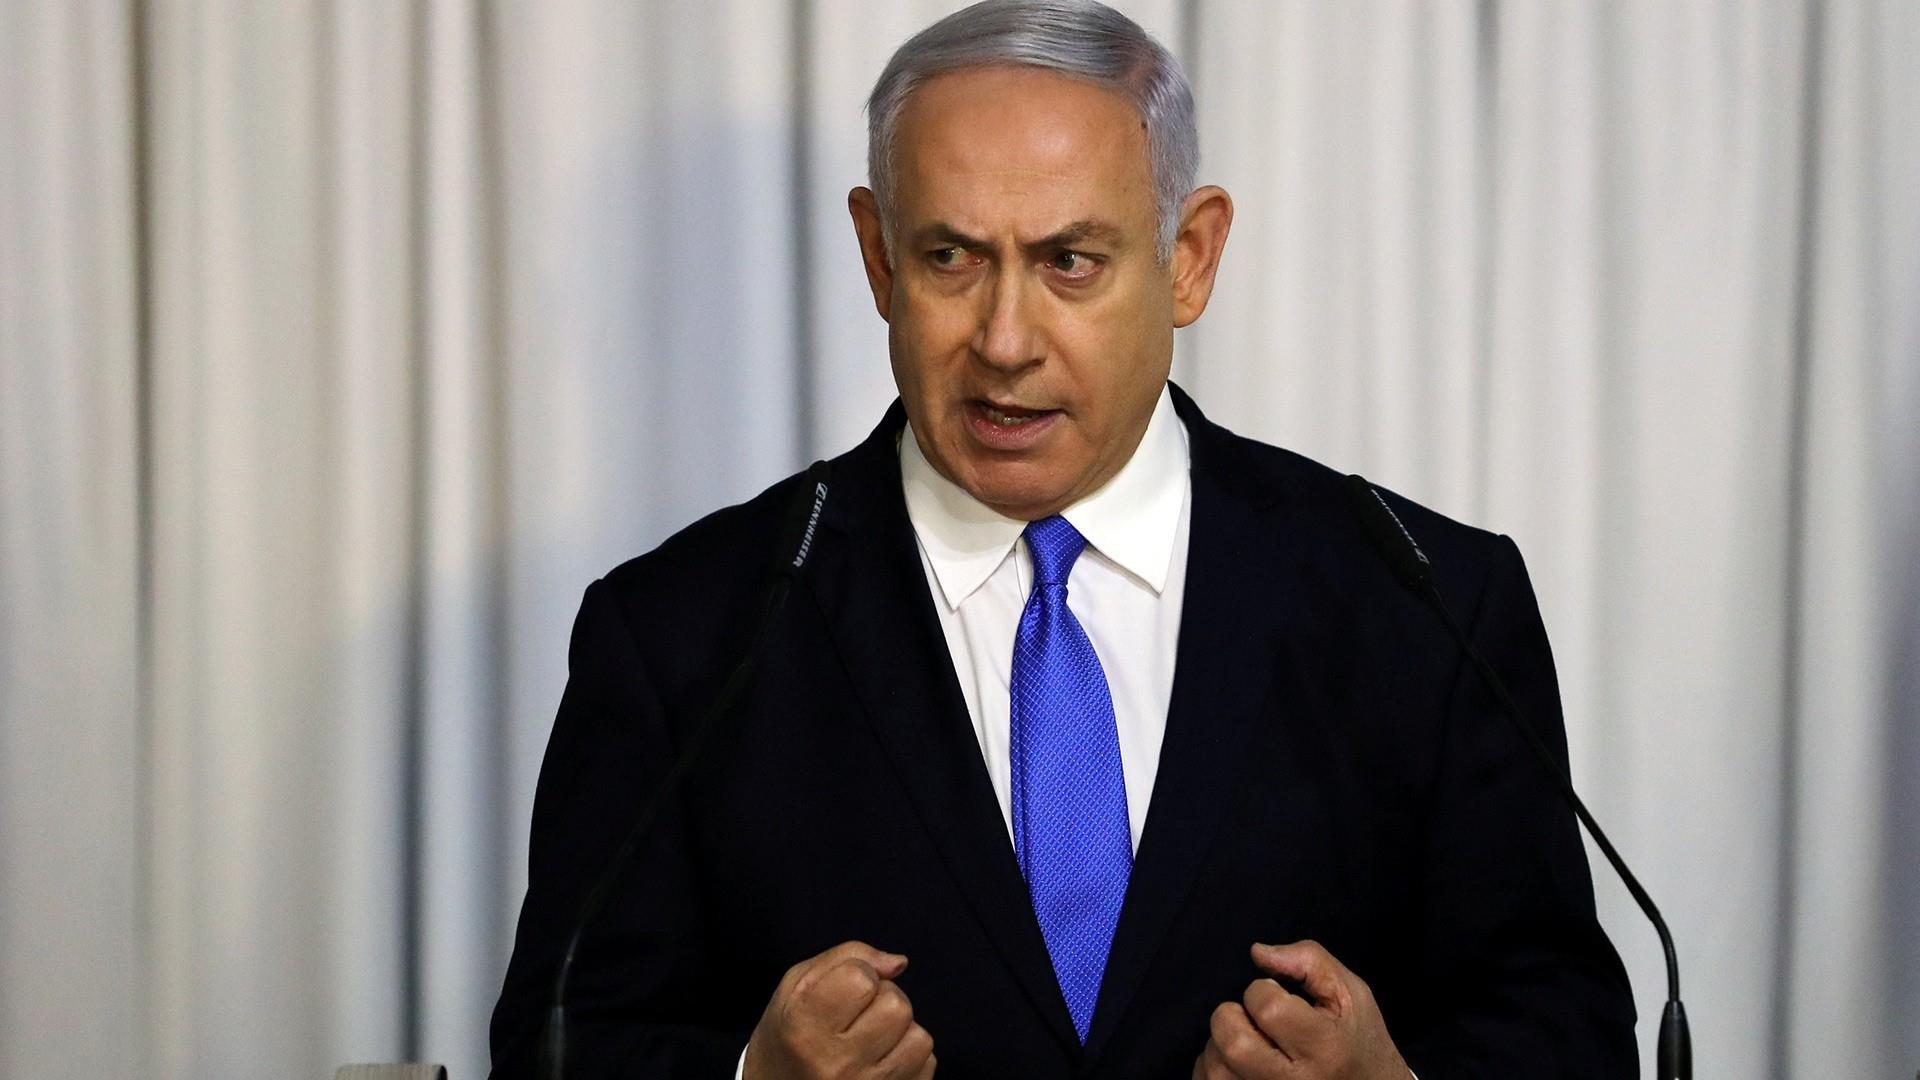 Trump, Netanyahu 'have unleashed horror in the American Jewish community'